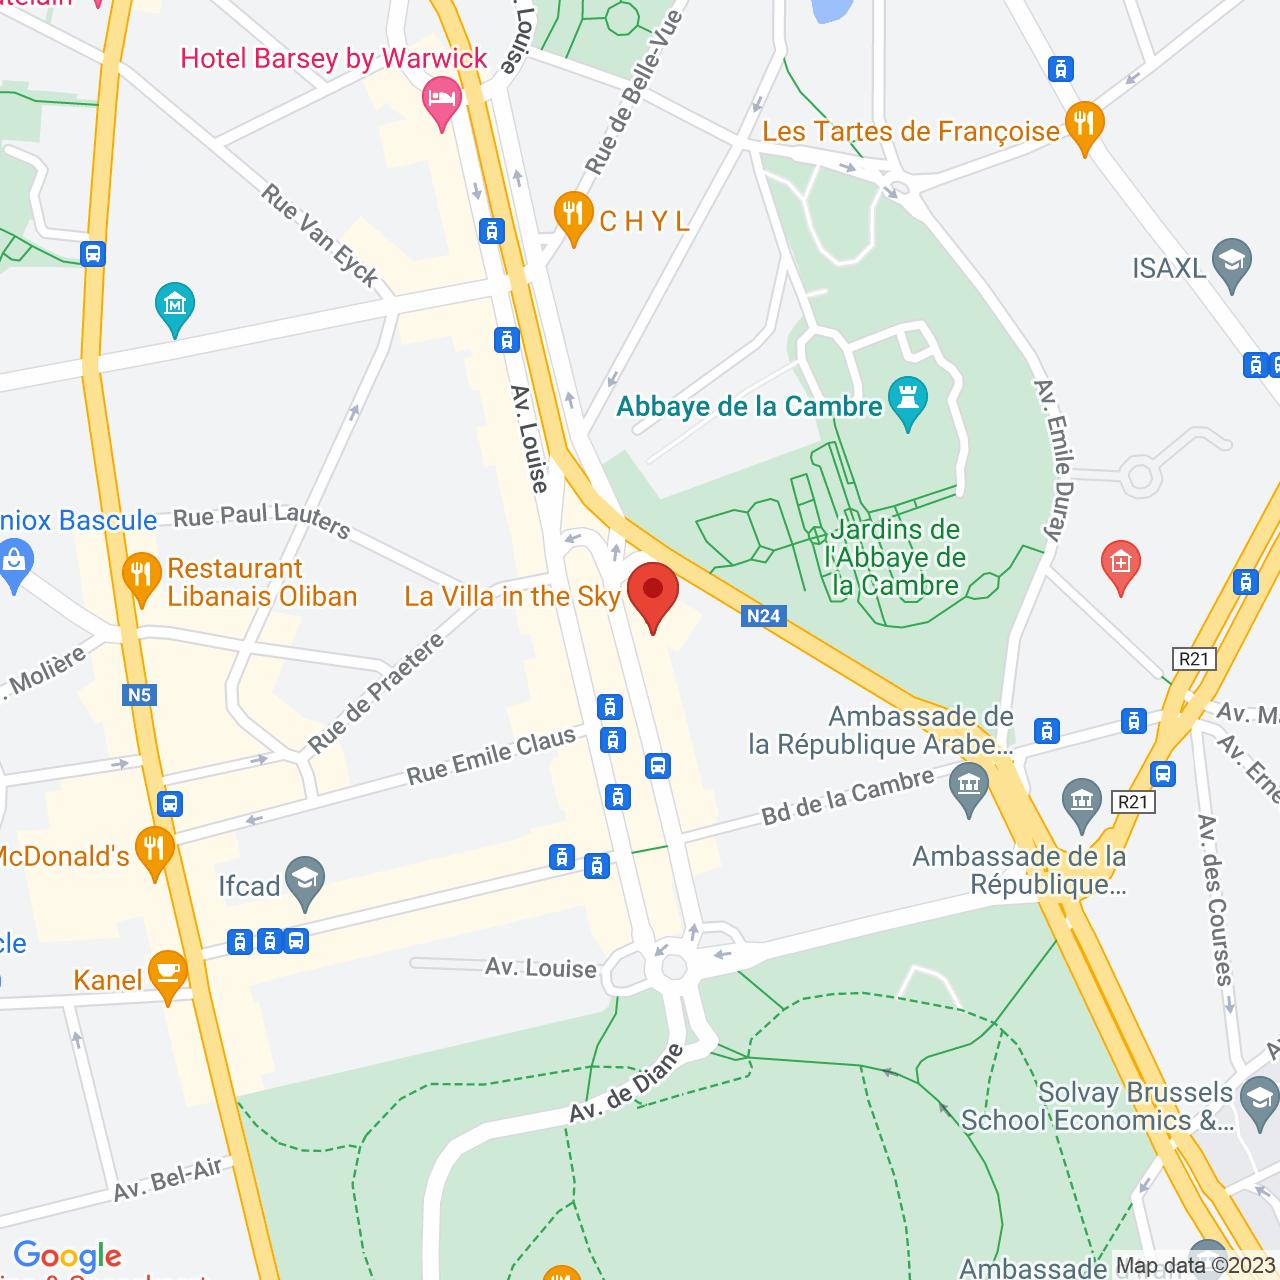 480 Avenue Louise, 18th floor - IT Tower, 1050 Brussels, Belgium